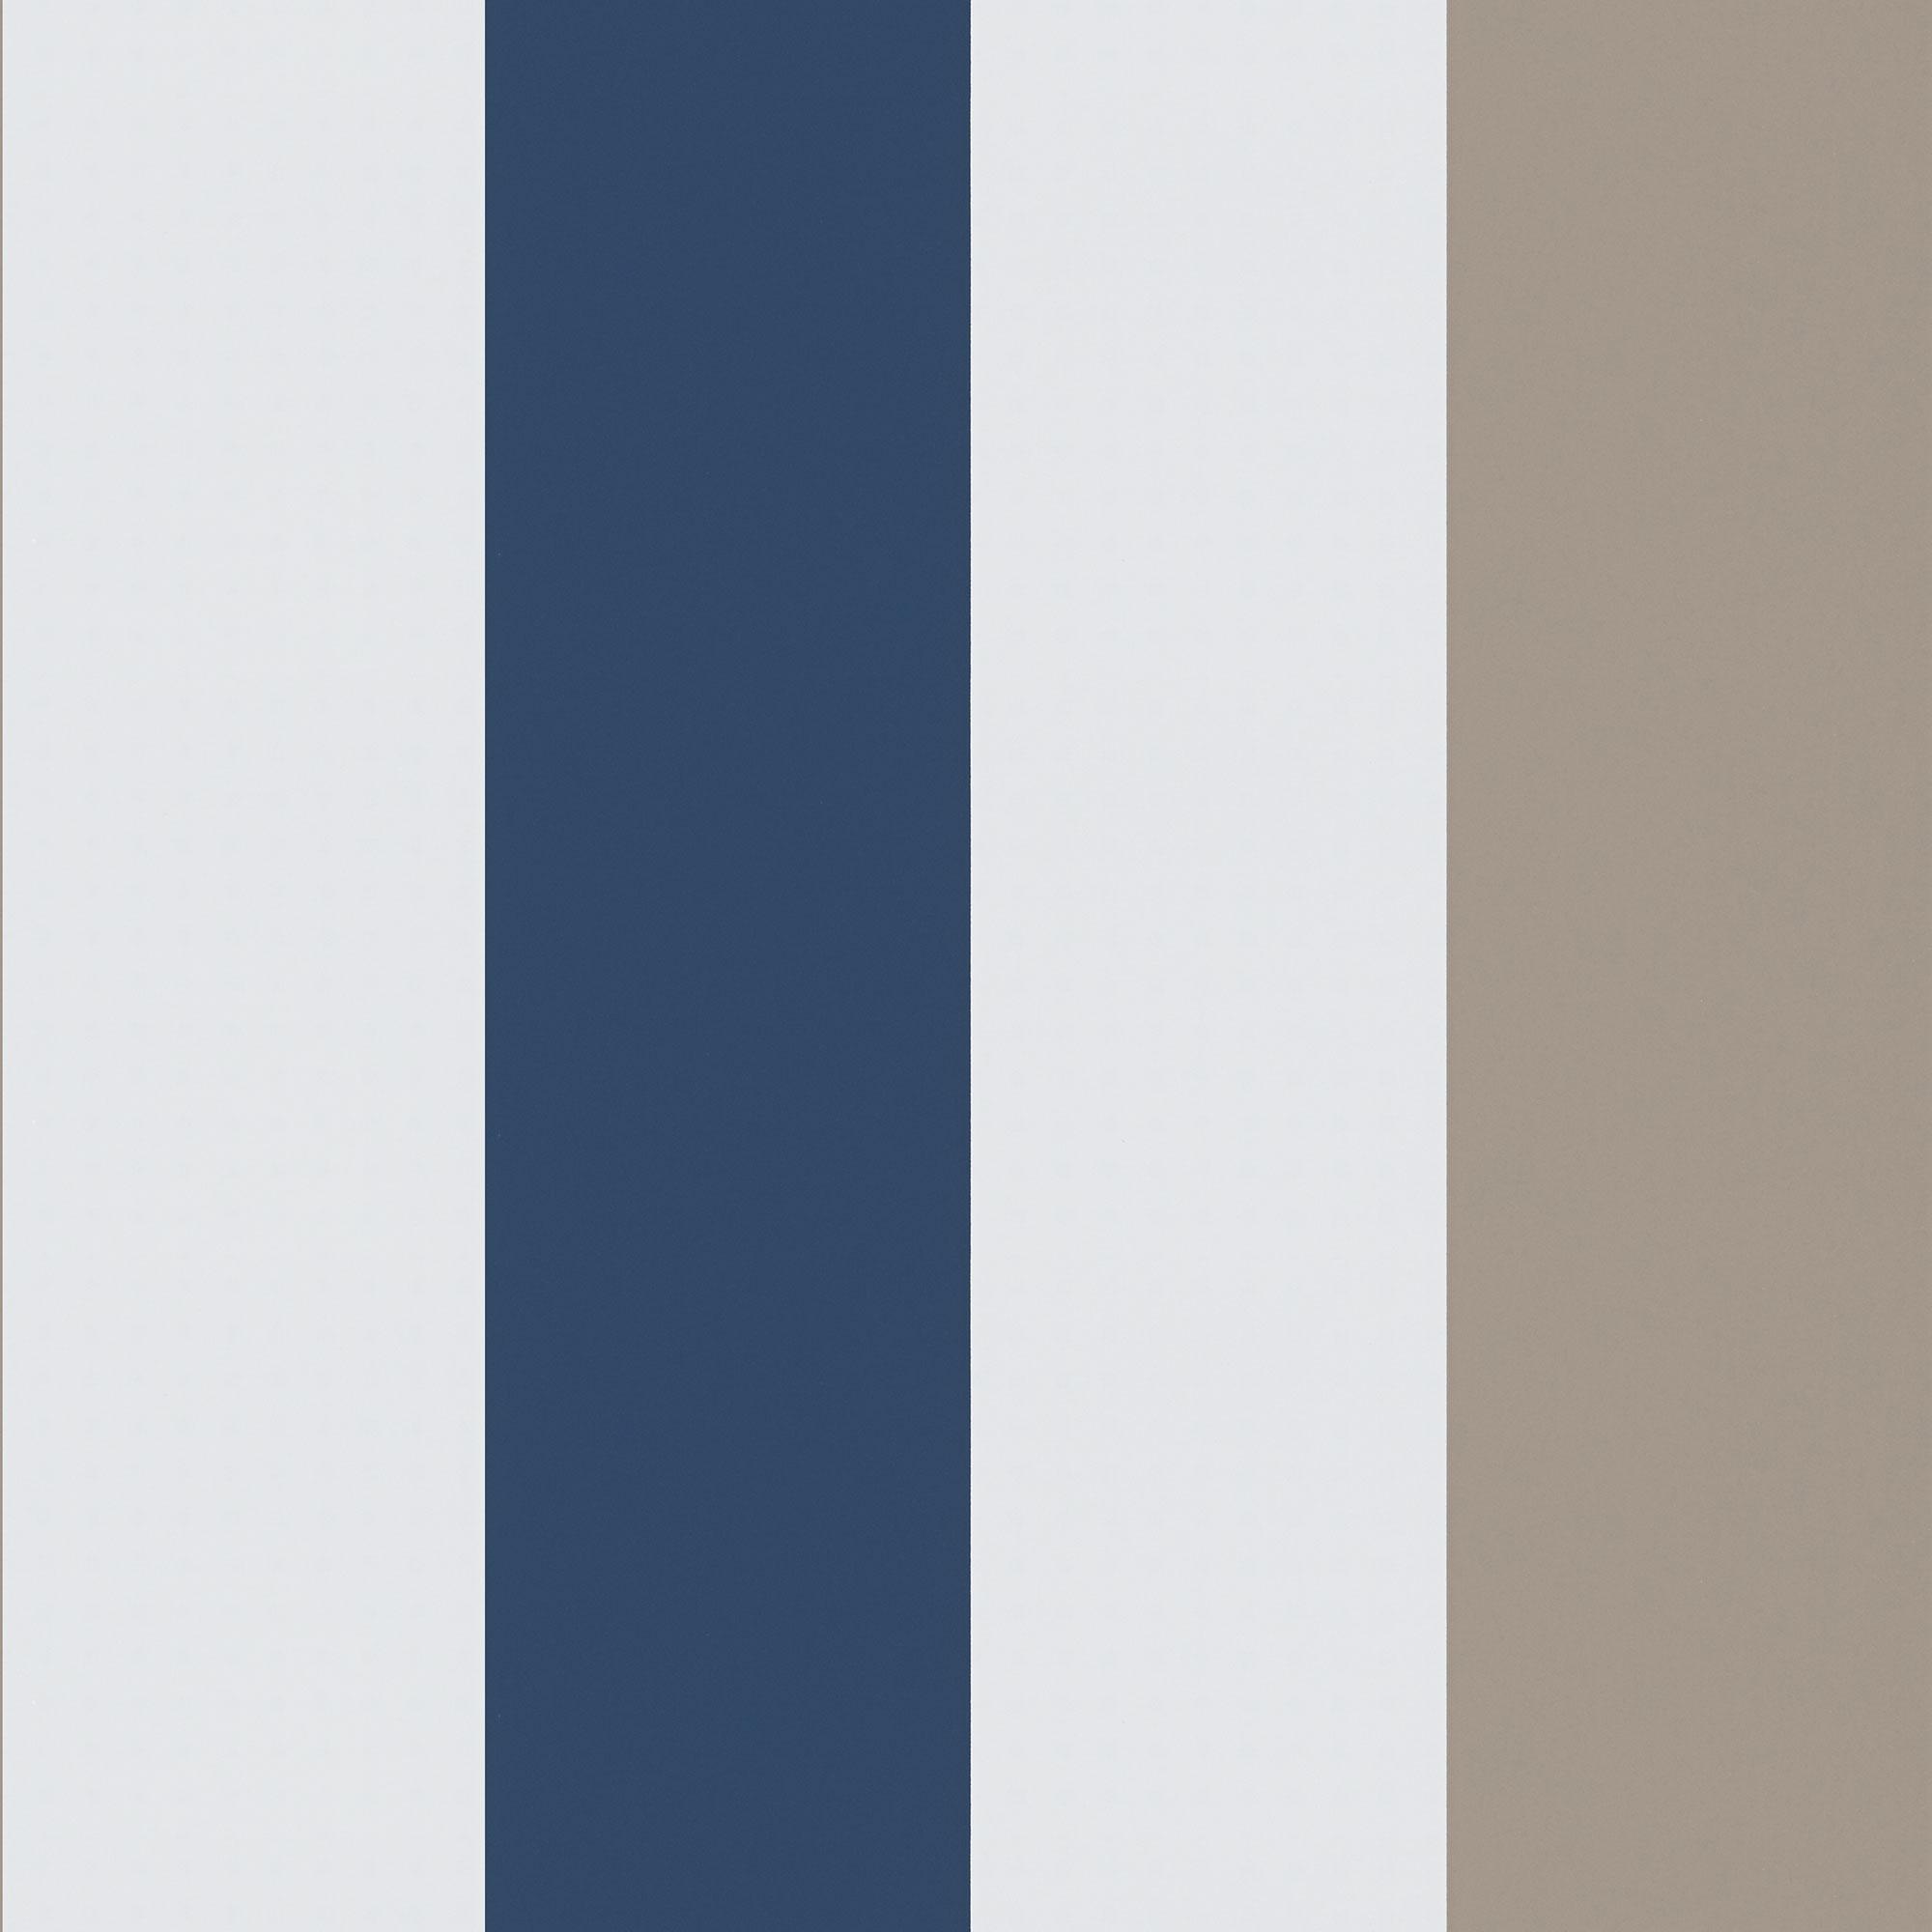 Шведские обои Sandberg,  коллекция Carl, артикул575-76